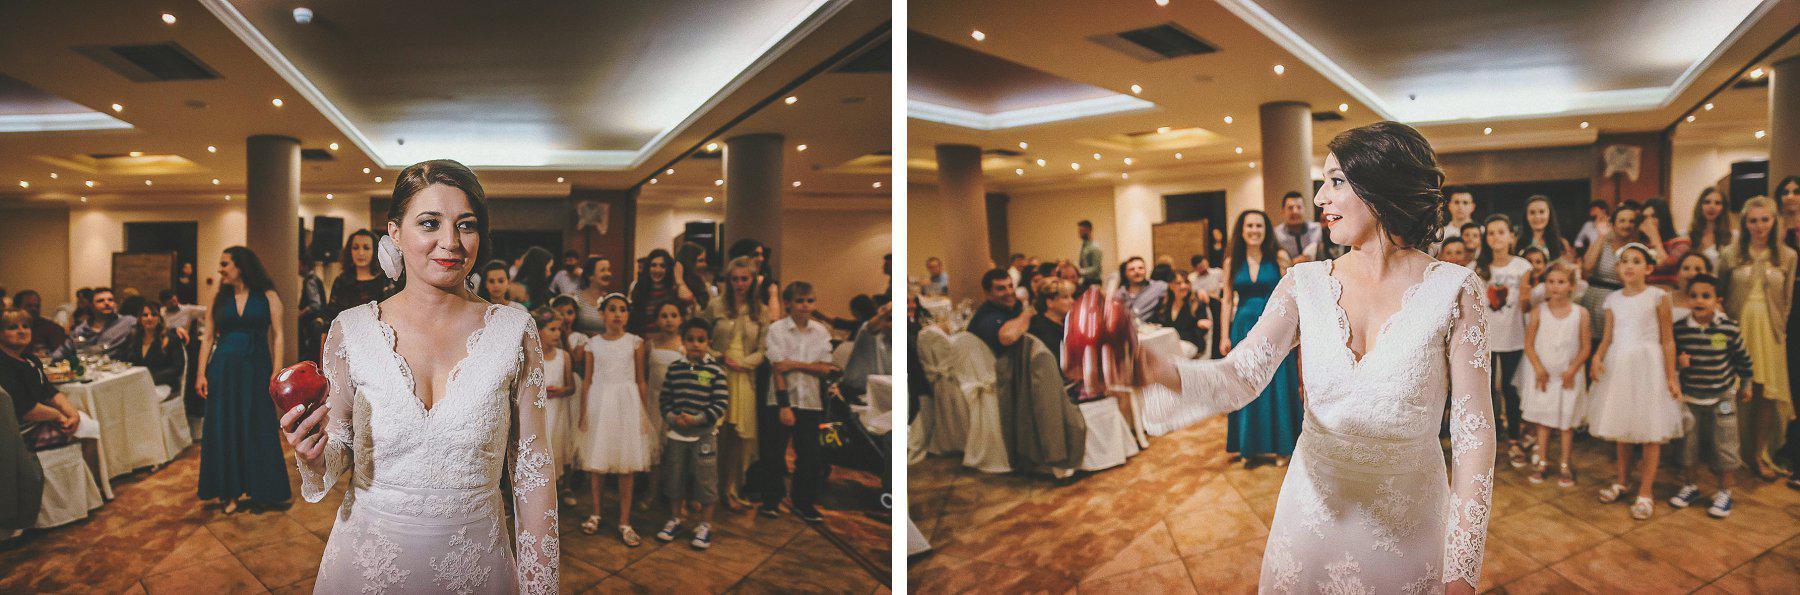 destination-wedding-in-lake-aitoliko-messolonghi-in-greece065